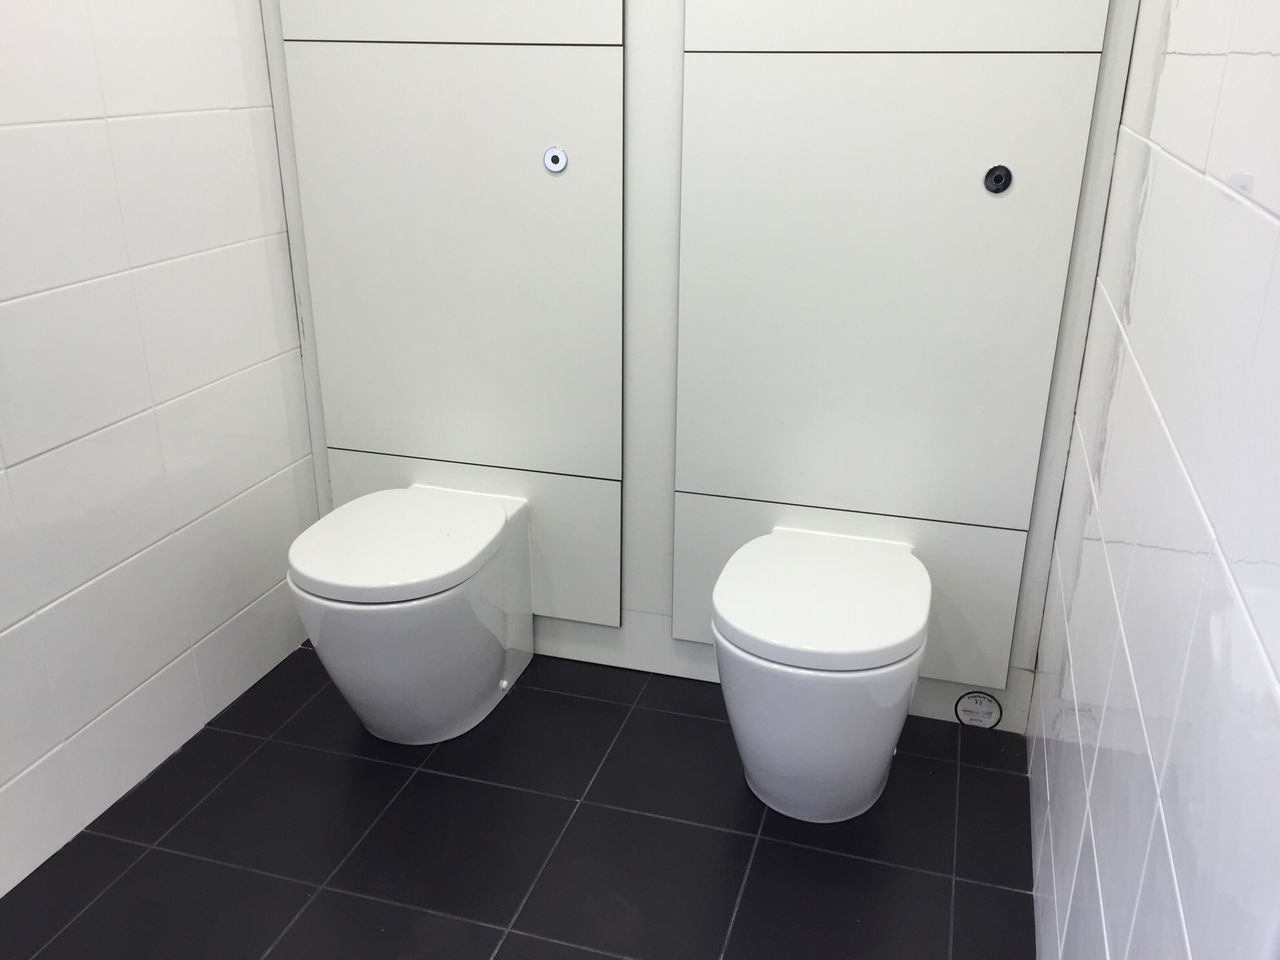 Toilet Toilets Double Tiles Flush Something Different Something Missing White Toilet Seat Panels Blackandwhite Black And White Black